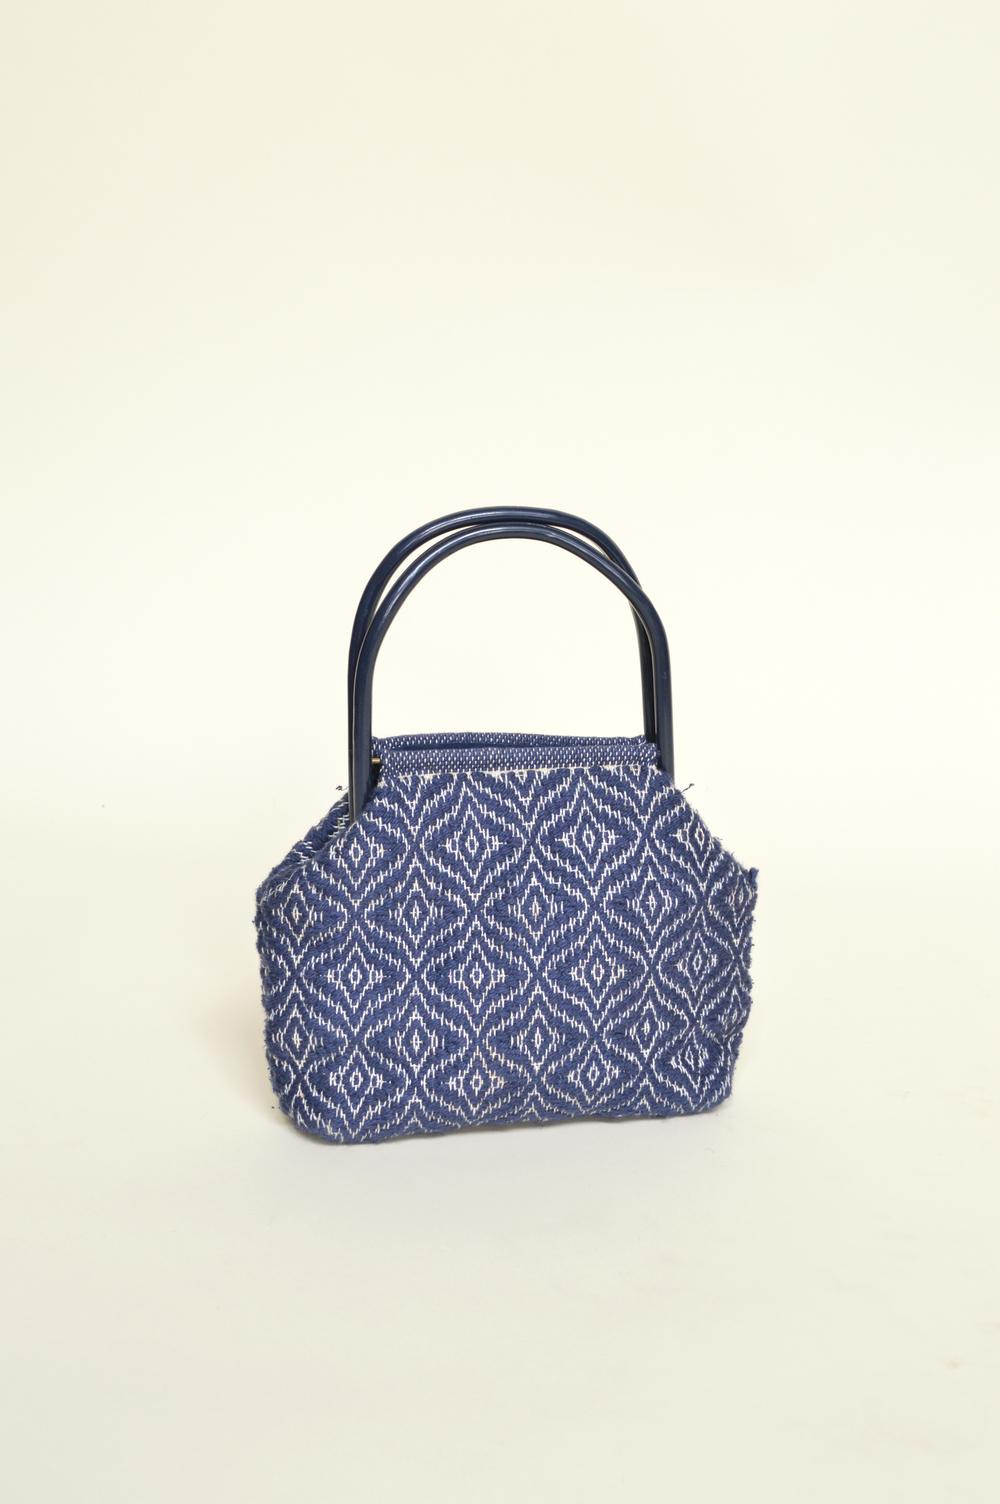 Vintage handbag from Dalena Vintage